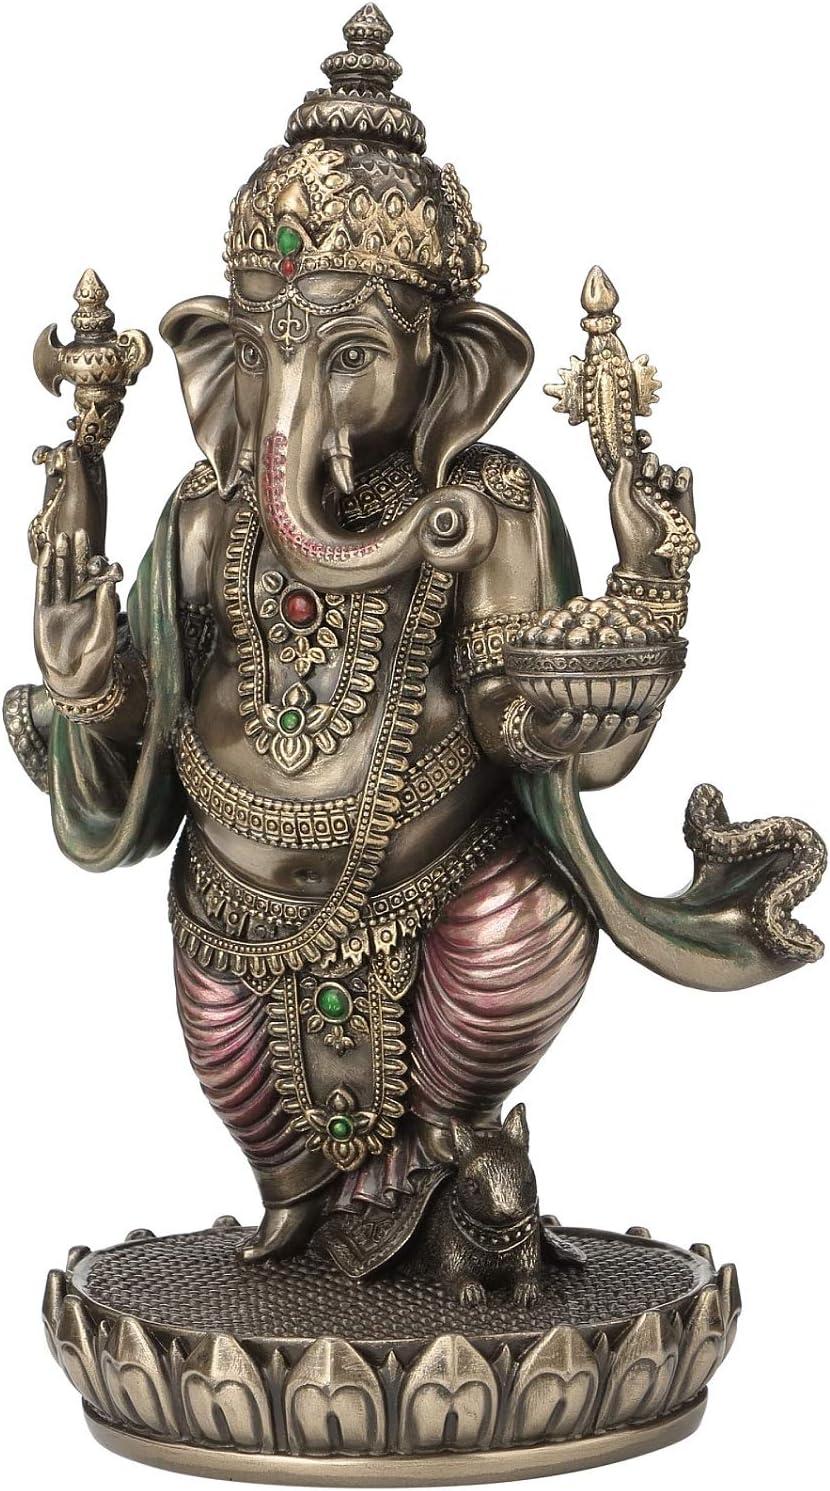 JFSM INC Standing Ganesh Hindu Elephant God of Success Statue Ganesha 7 1//2-inch